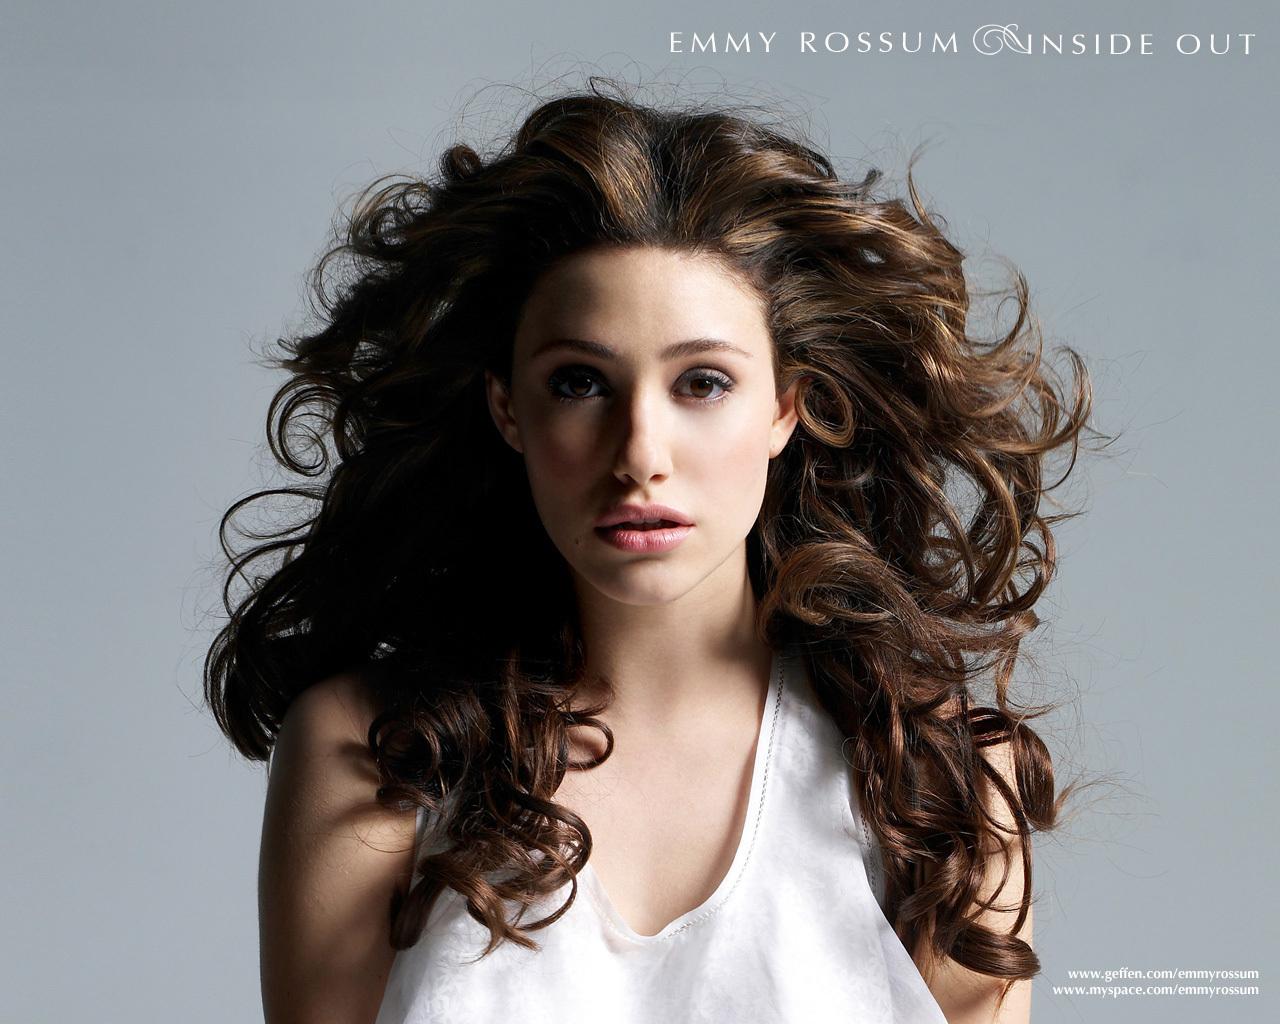 http://images1.fanpop.com/images/photos/2100000/Emmy-wallpaper-emmy-rossum-2188428-1280-1024.jpg